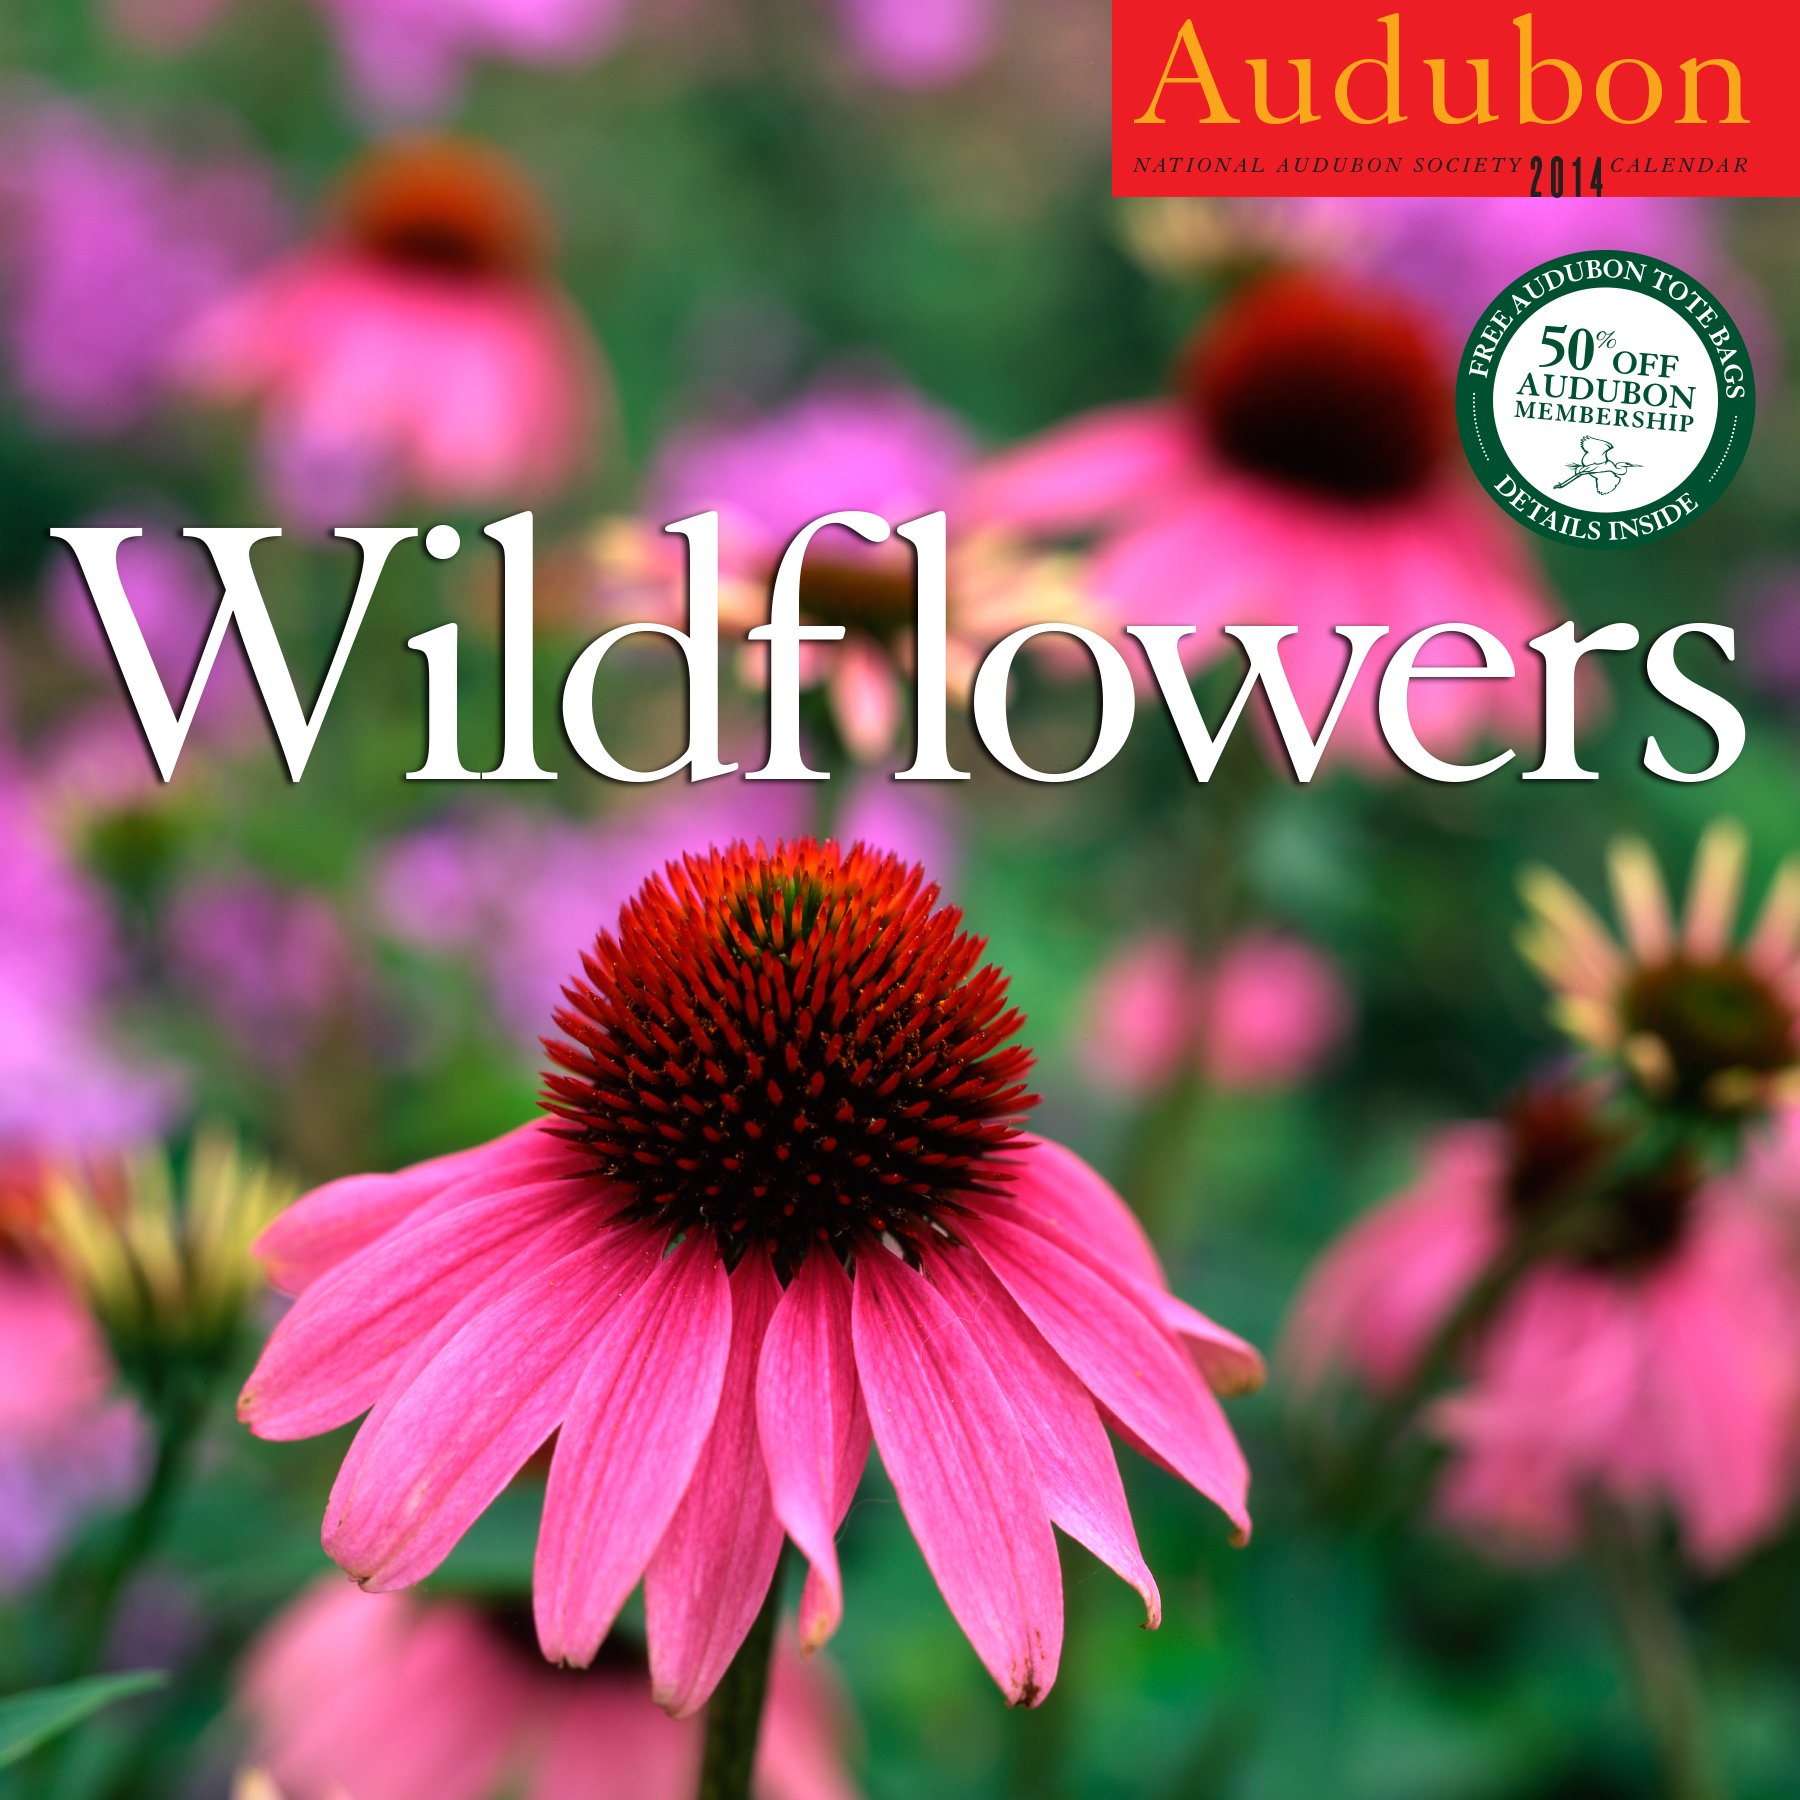 Audubon Wildflowers Calendar 2014: National Audubon Society: 9781579655204:  Amazon.com: Books